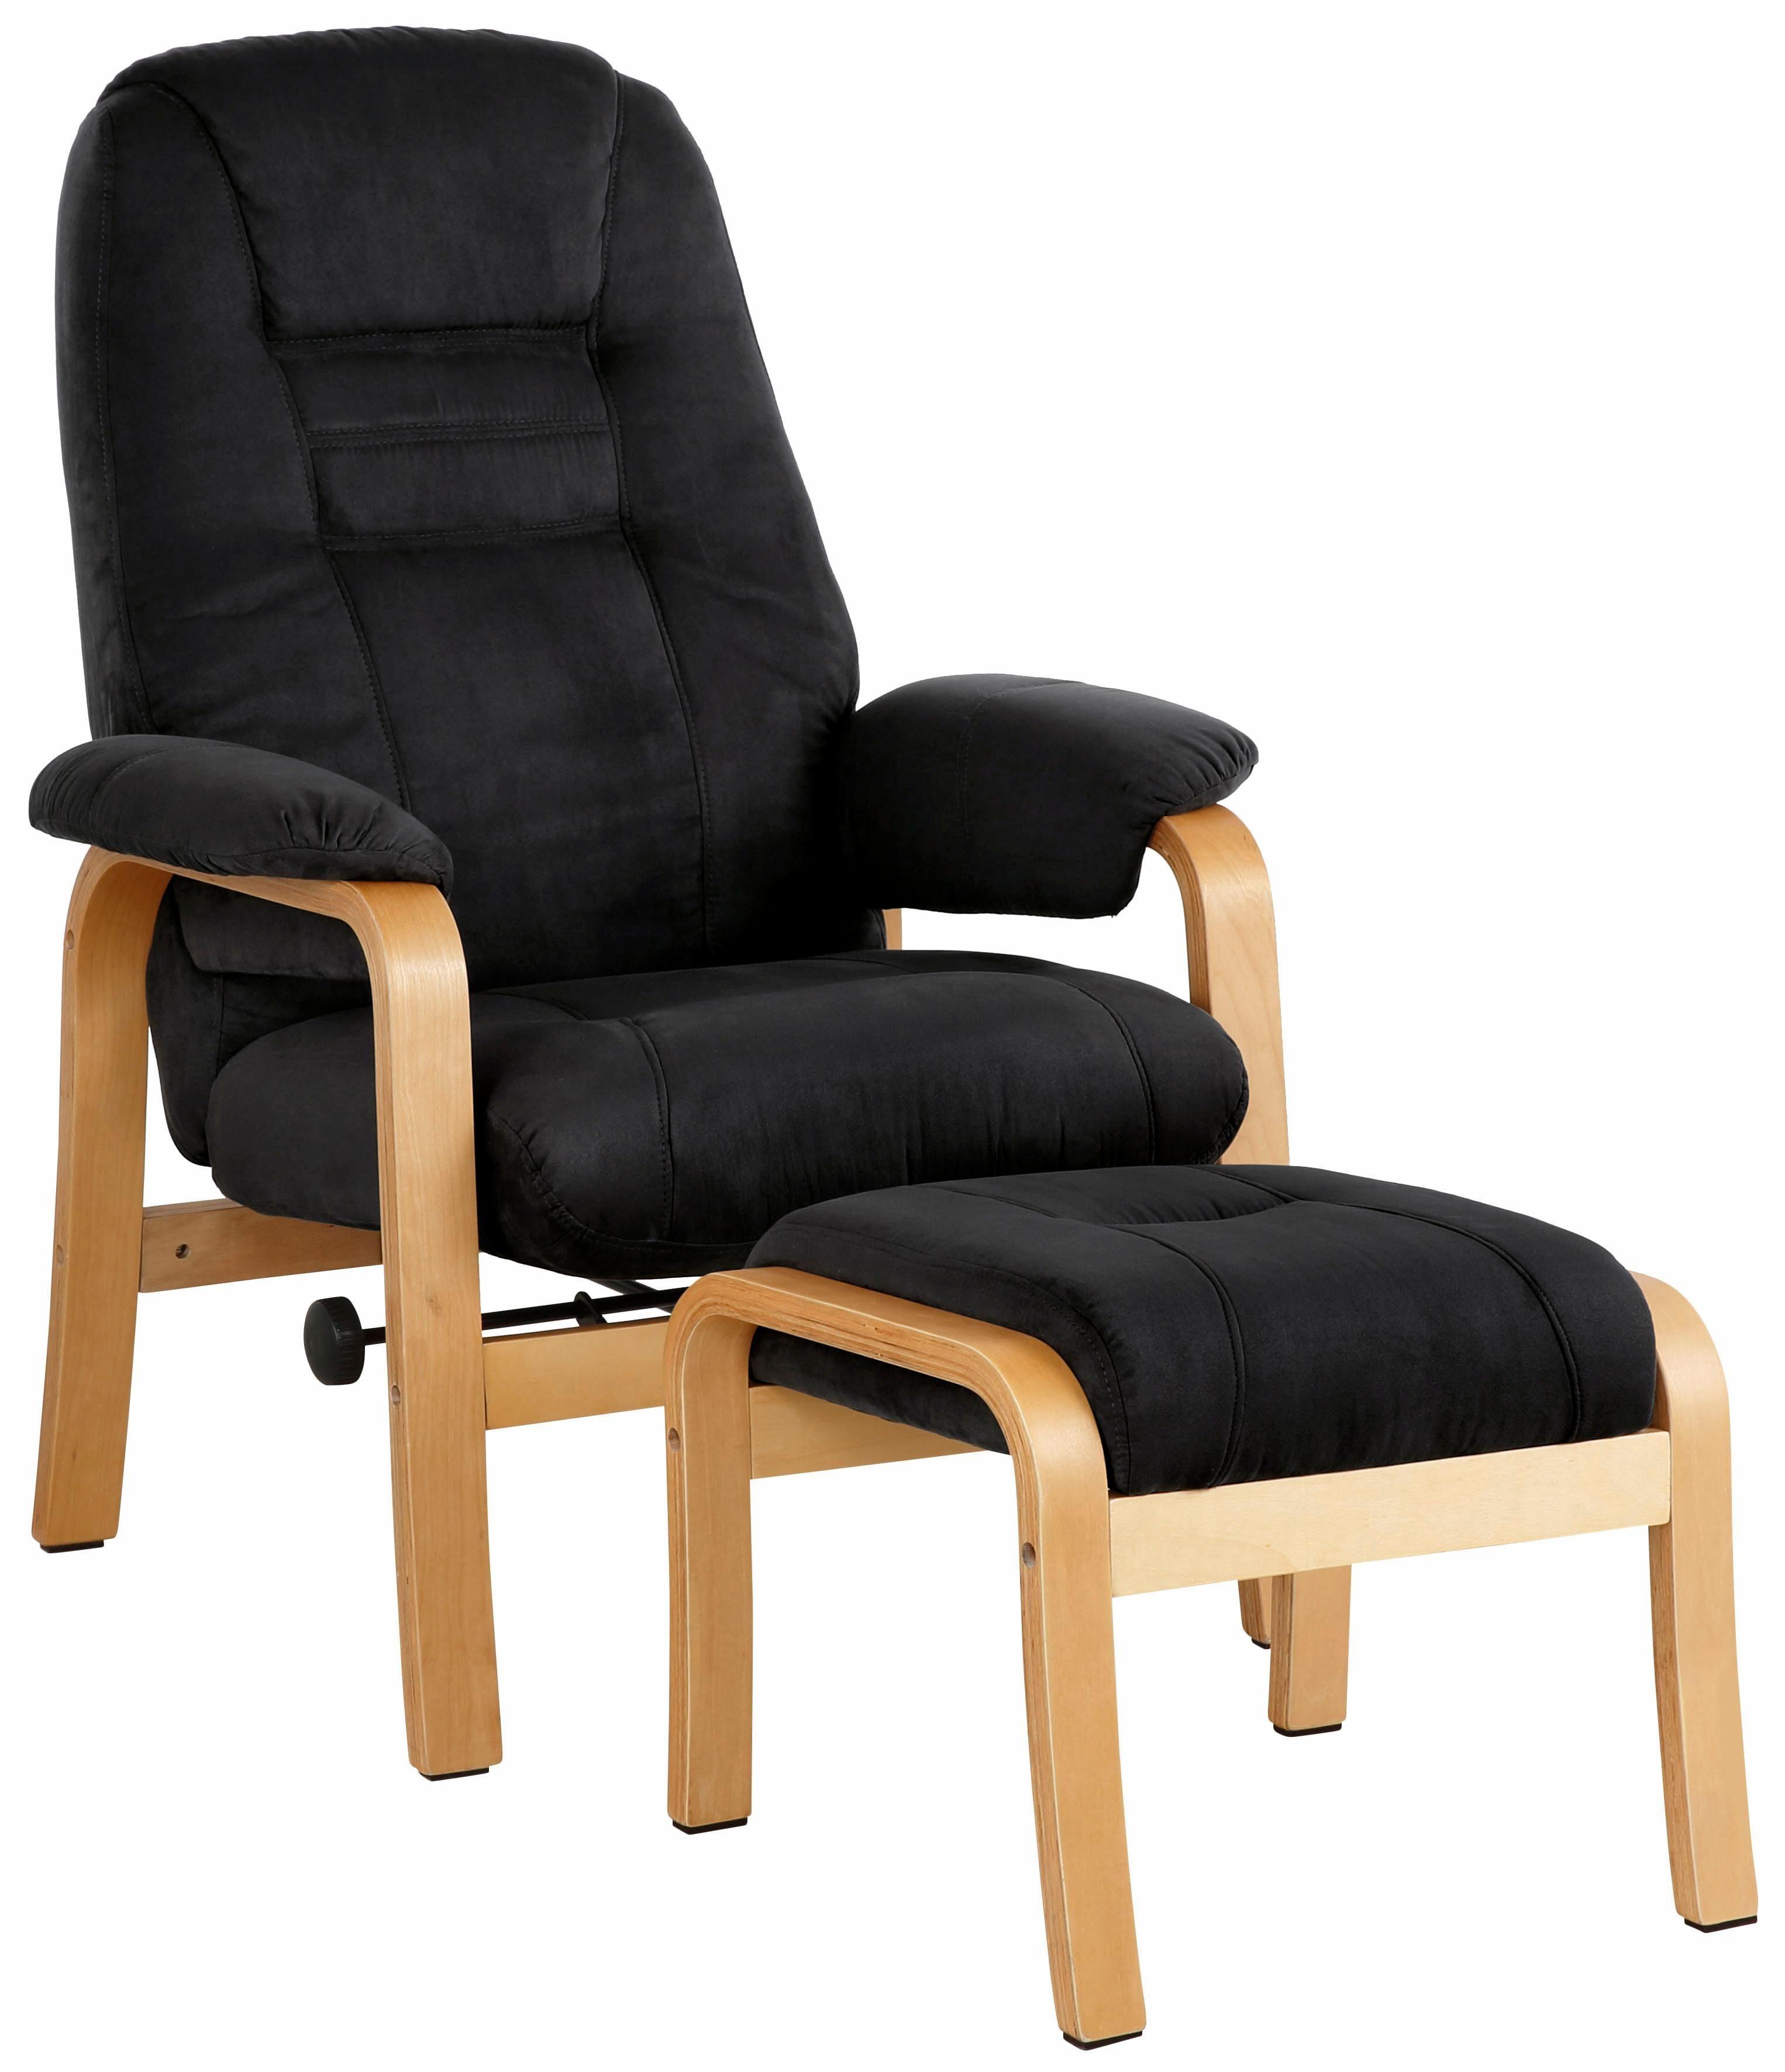 Home affaire Relaxsessel Avignon kippbar mit Hocker Holzgestell online kaufen  OTTO